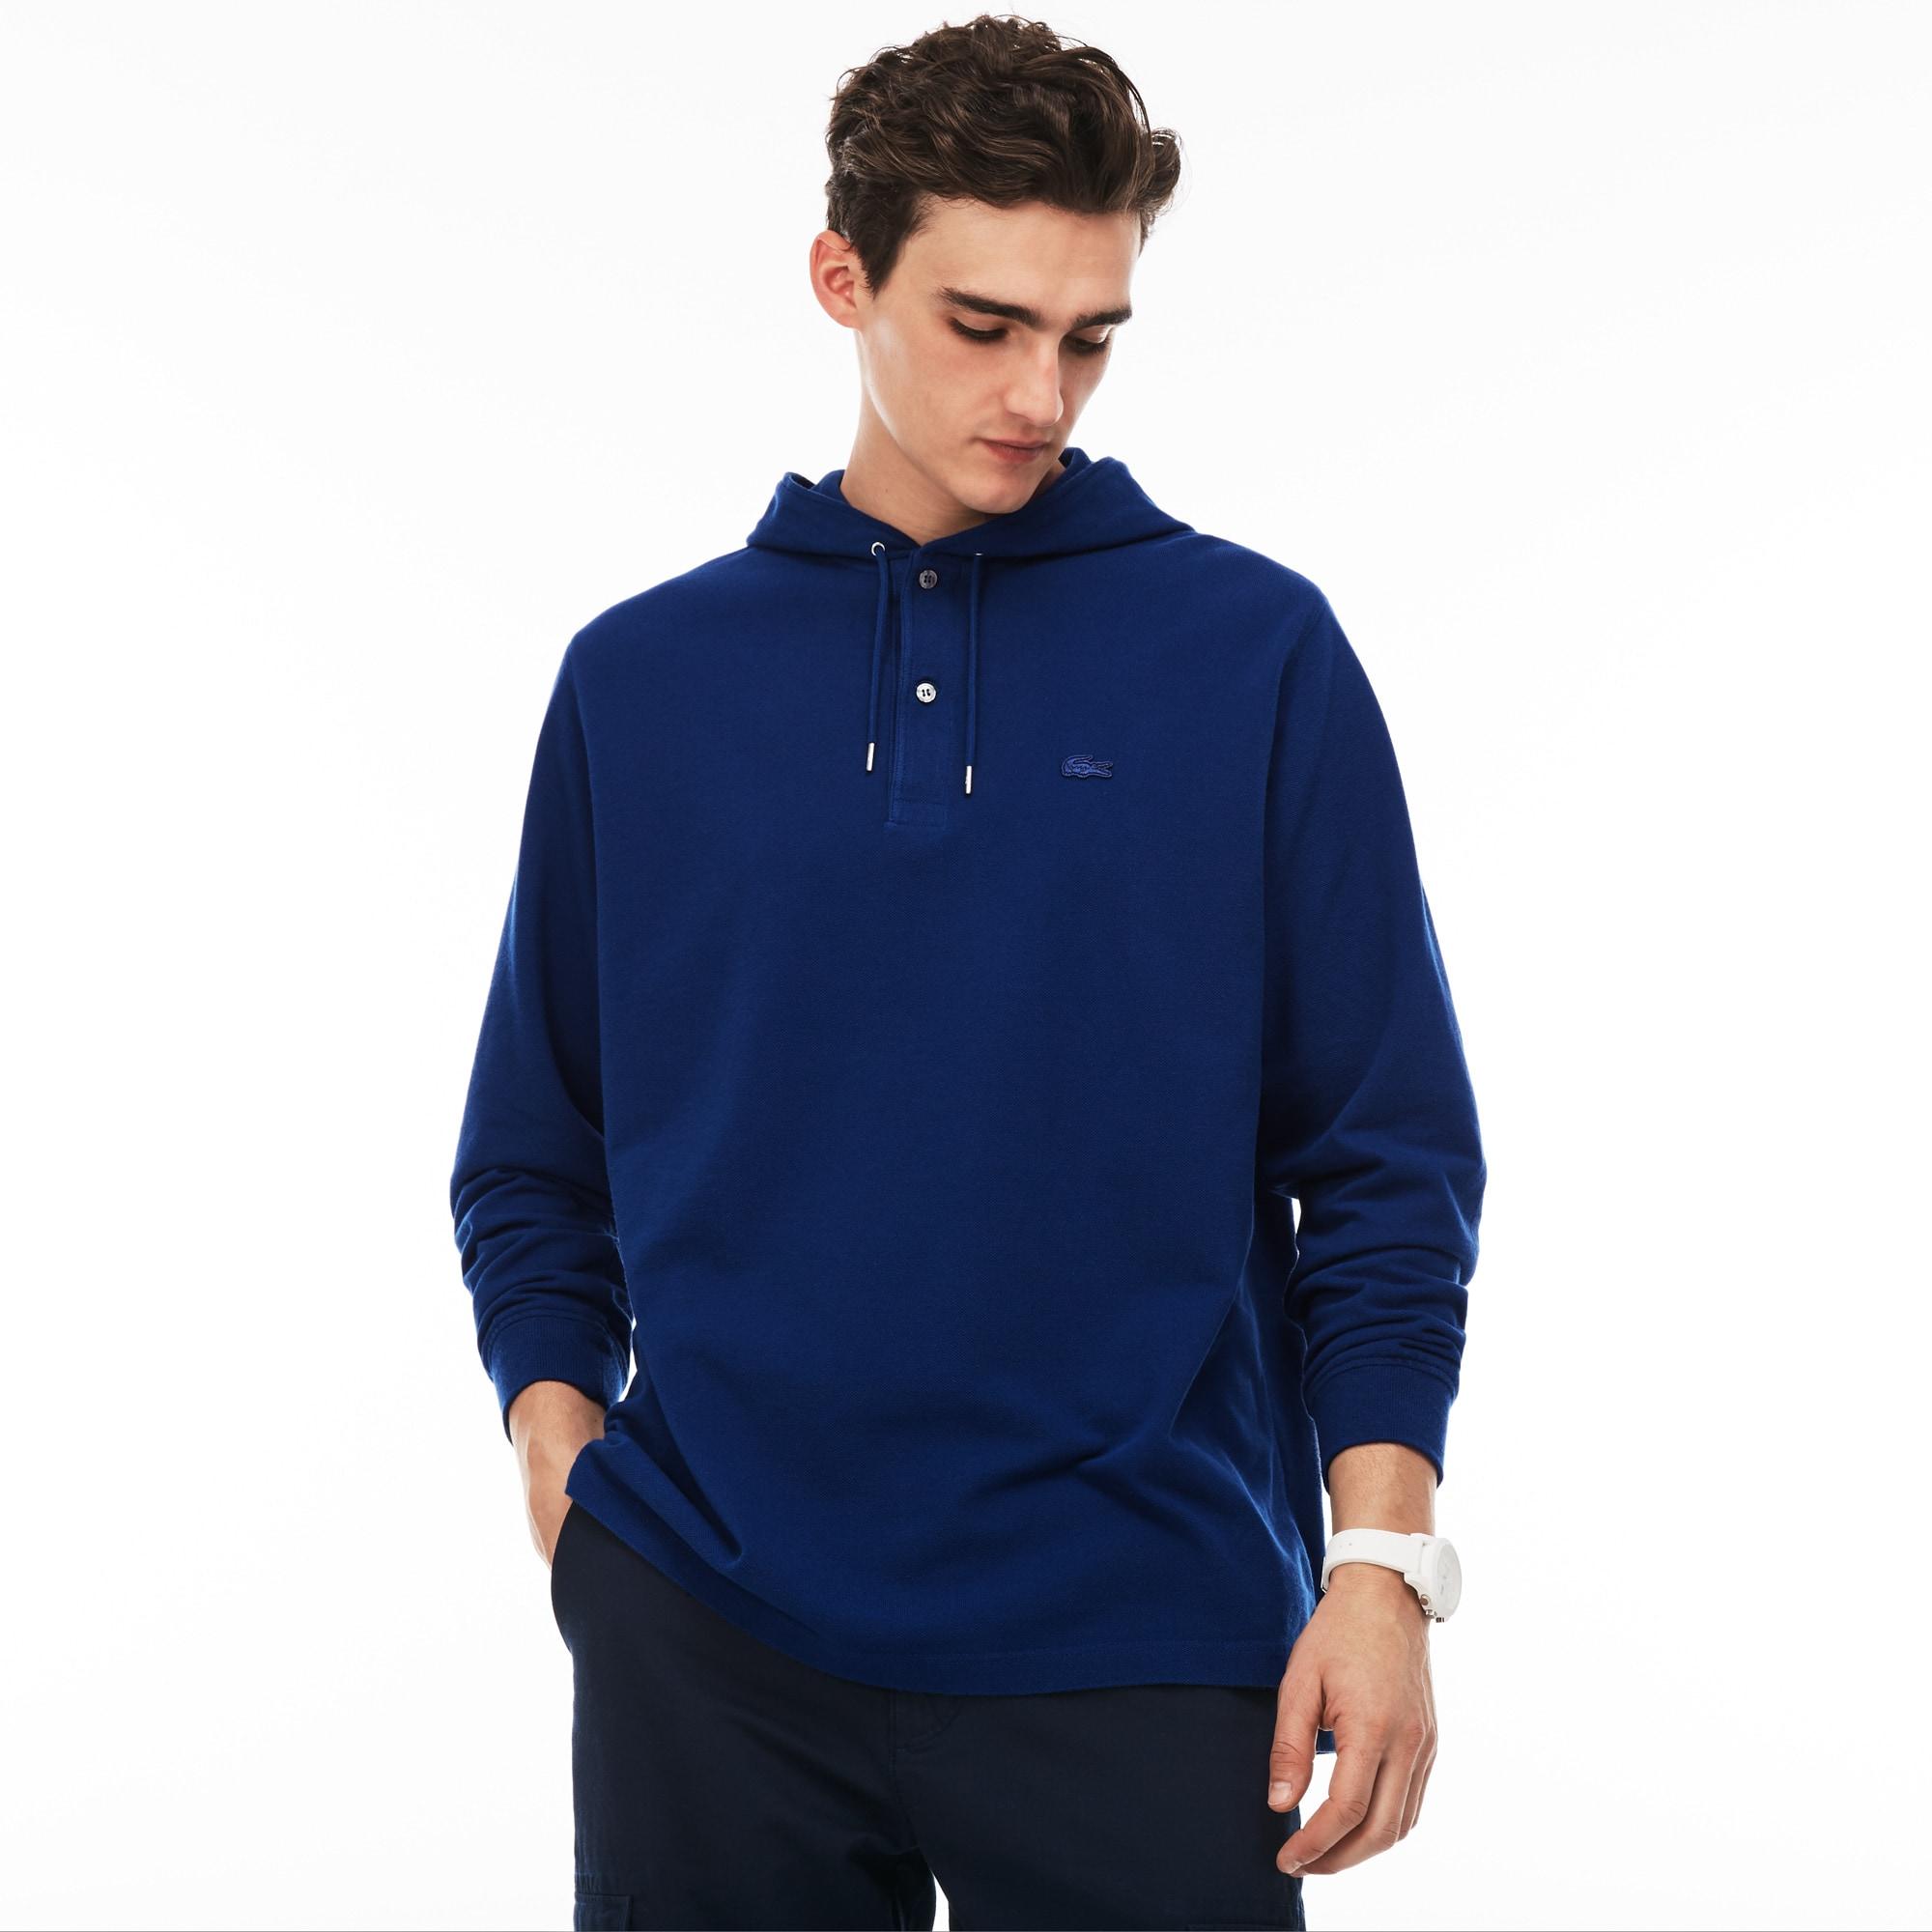 Men's Relaxed Fit Petit Piqué Hooded T-shirt